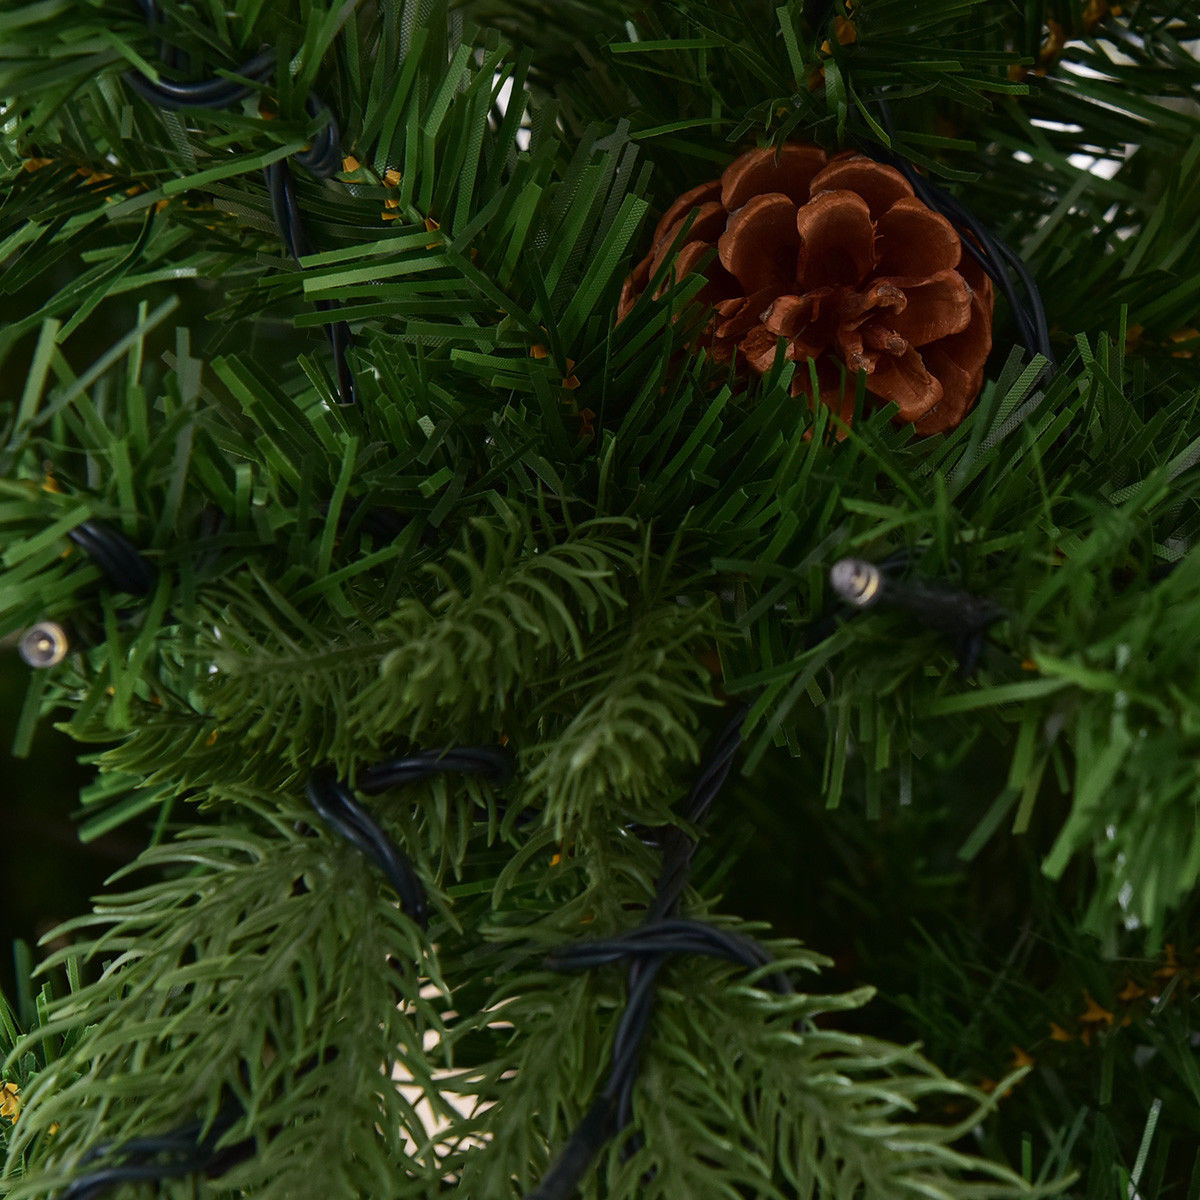 7Ft Pre-Lit Artificial Christmas Tree Hinged w/ 460 LED Lights & Pine Cones - image 5 de 7